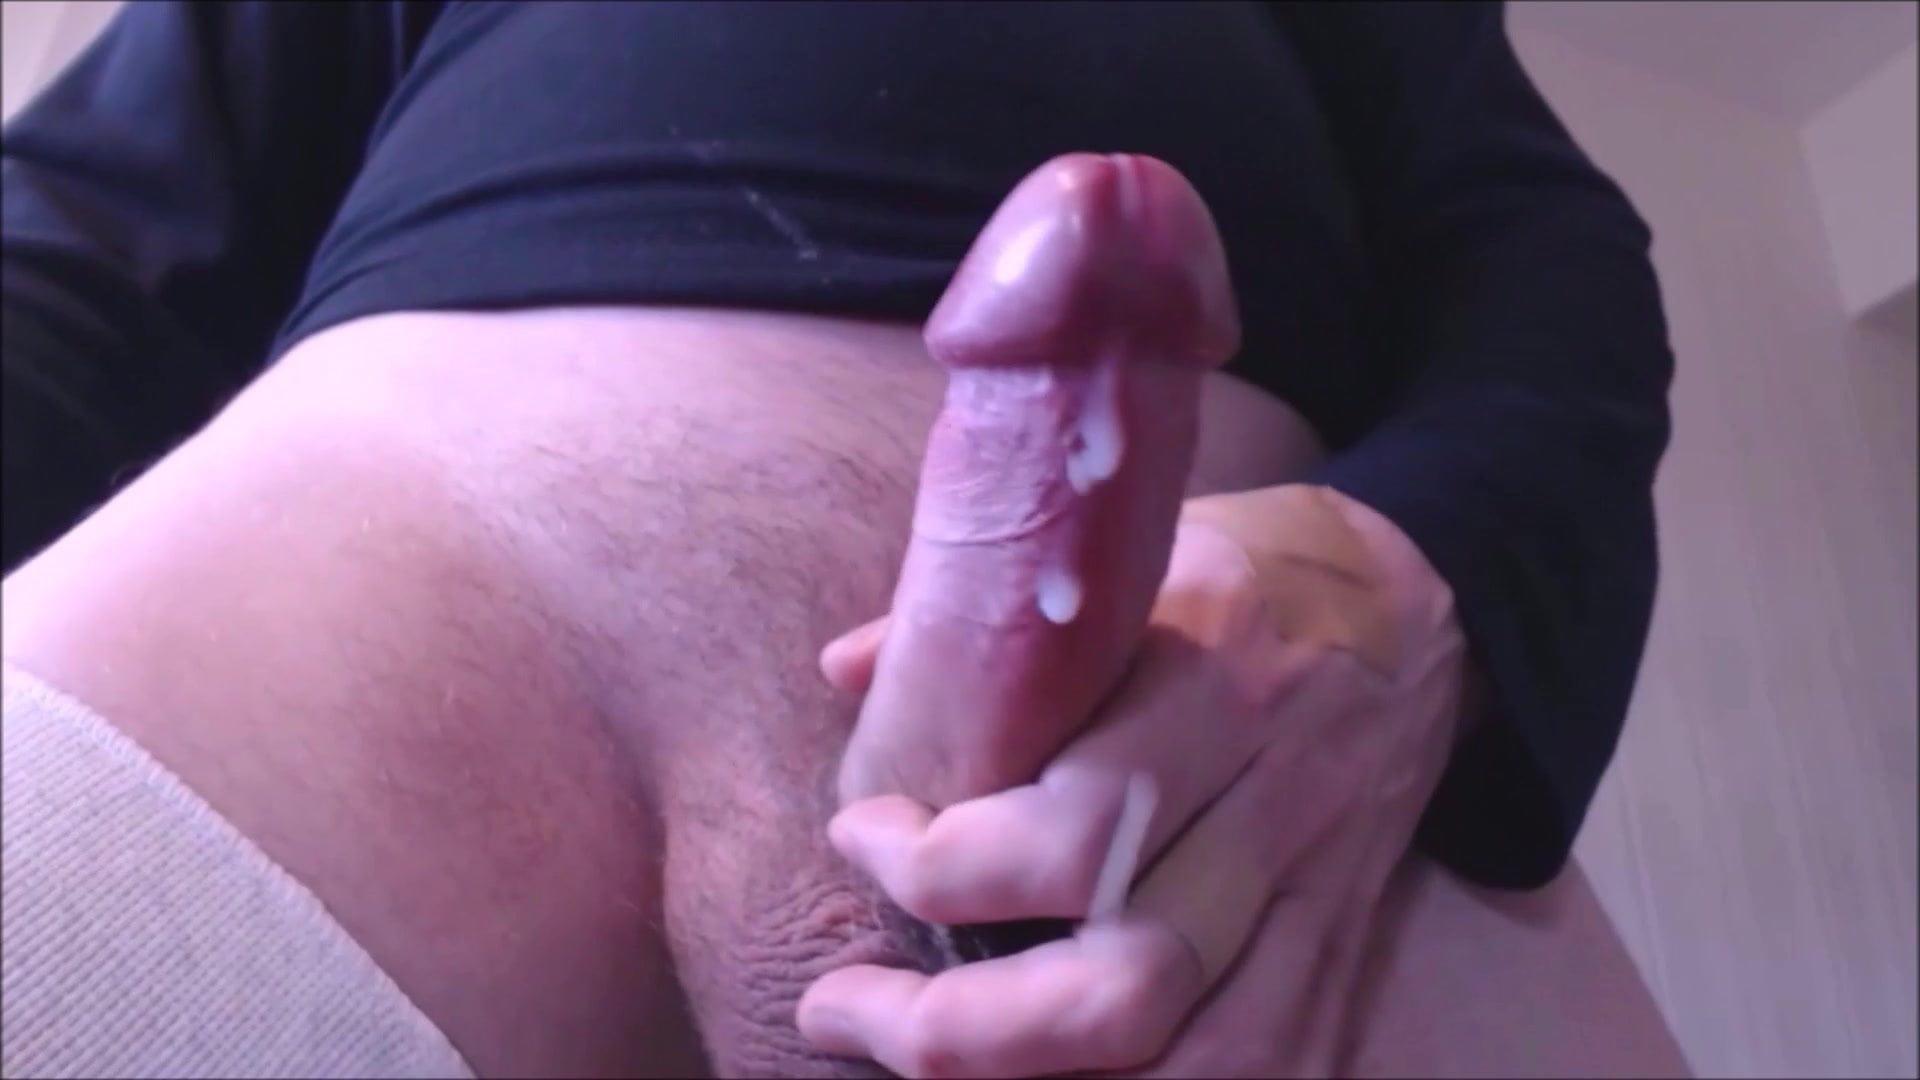 Нарезки сперма спусков после дрочки, дико мастурбирует фото